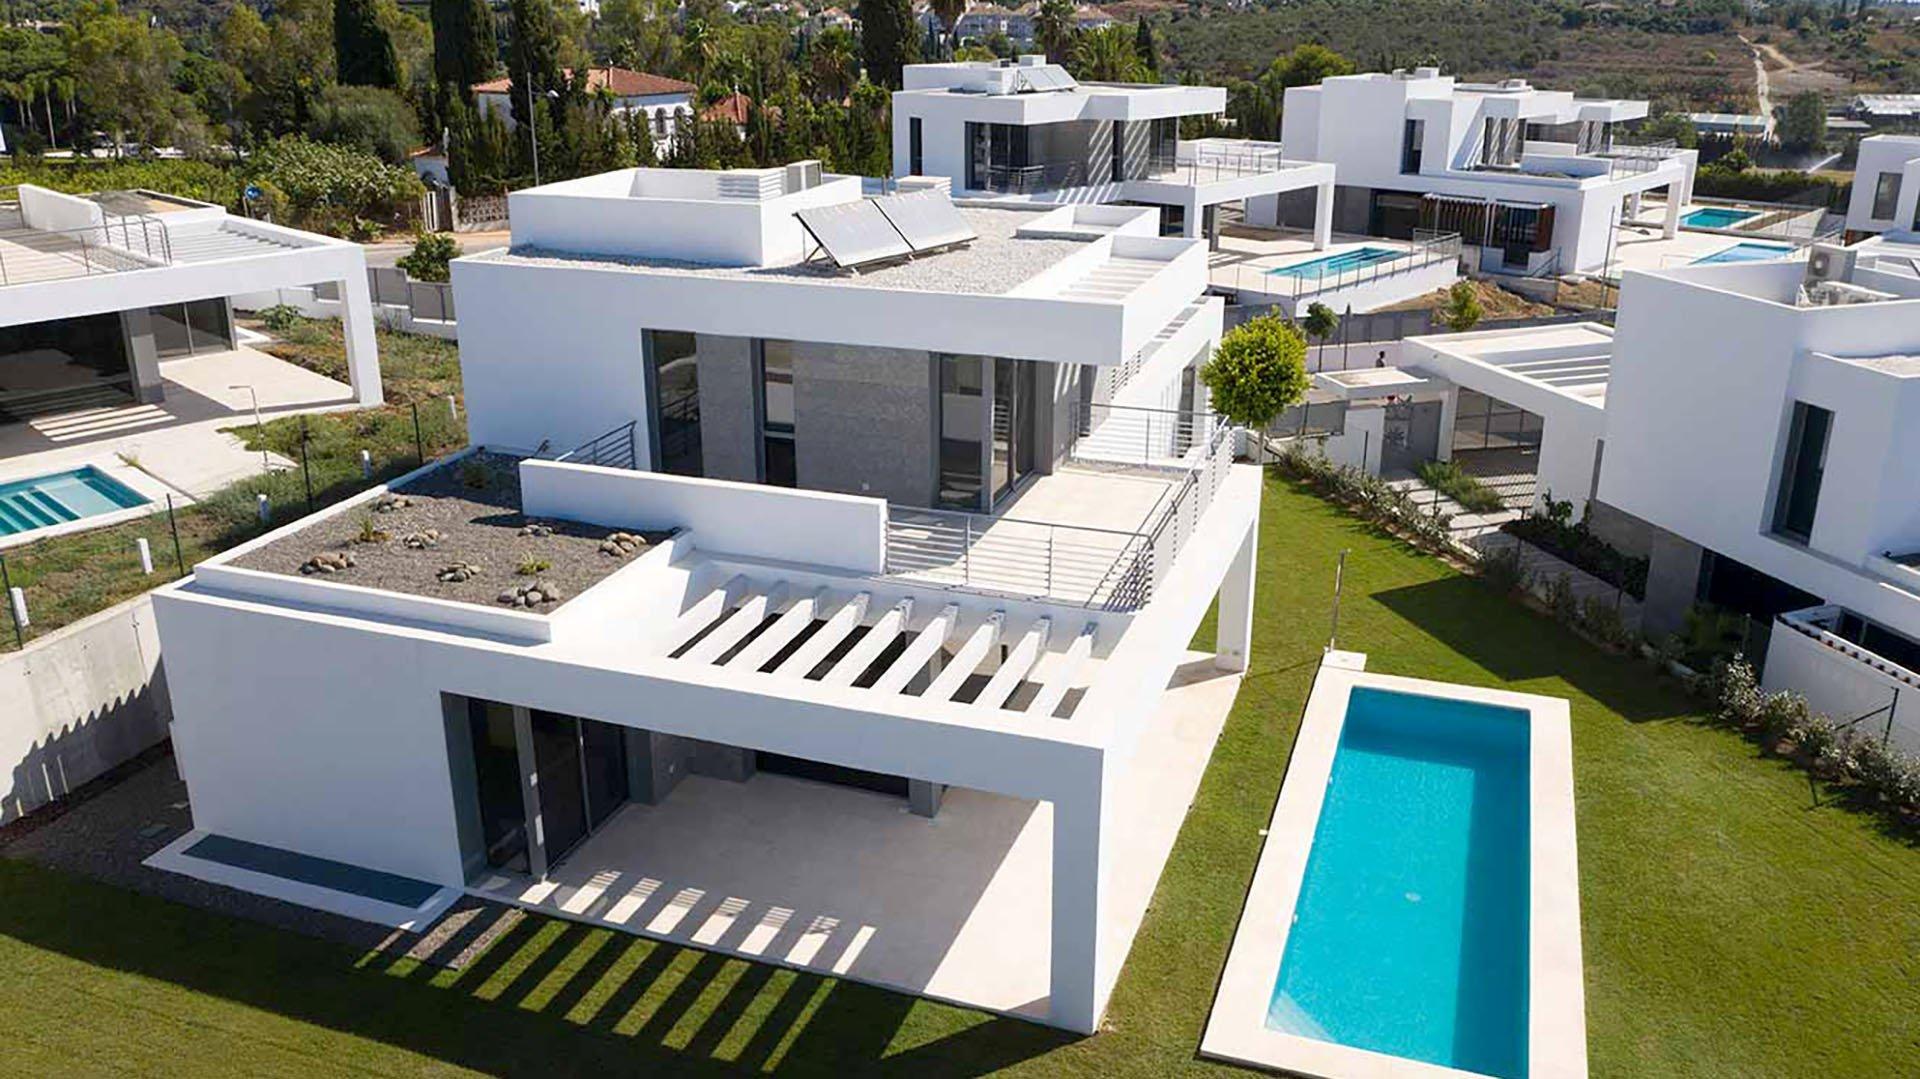 Syzygy The Villas : Moderne villa in Estepona op de New Golden Mile